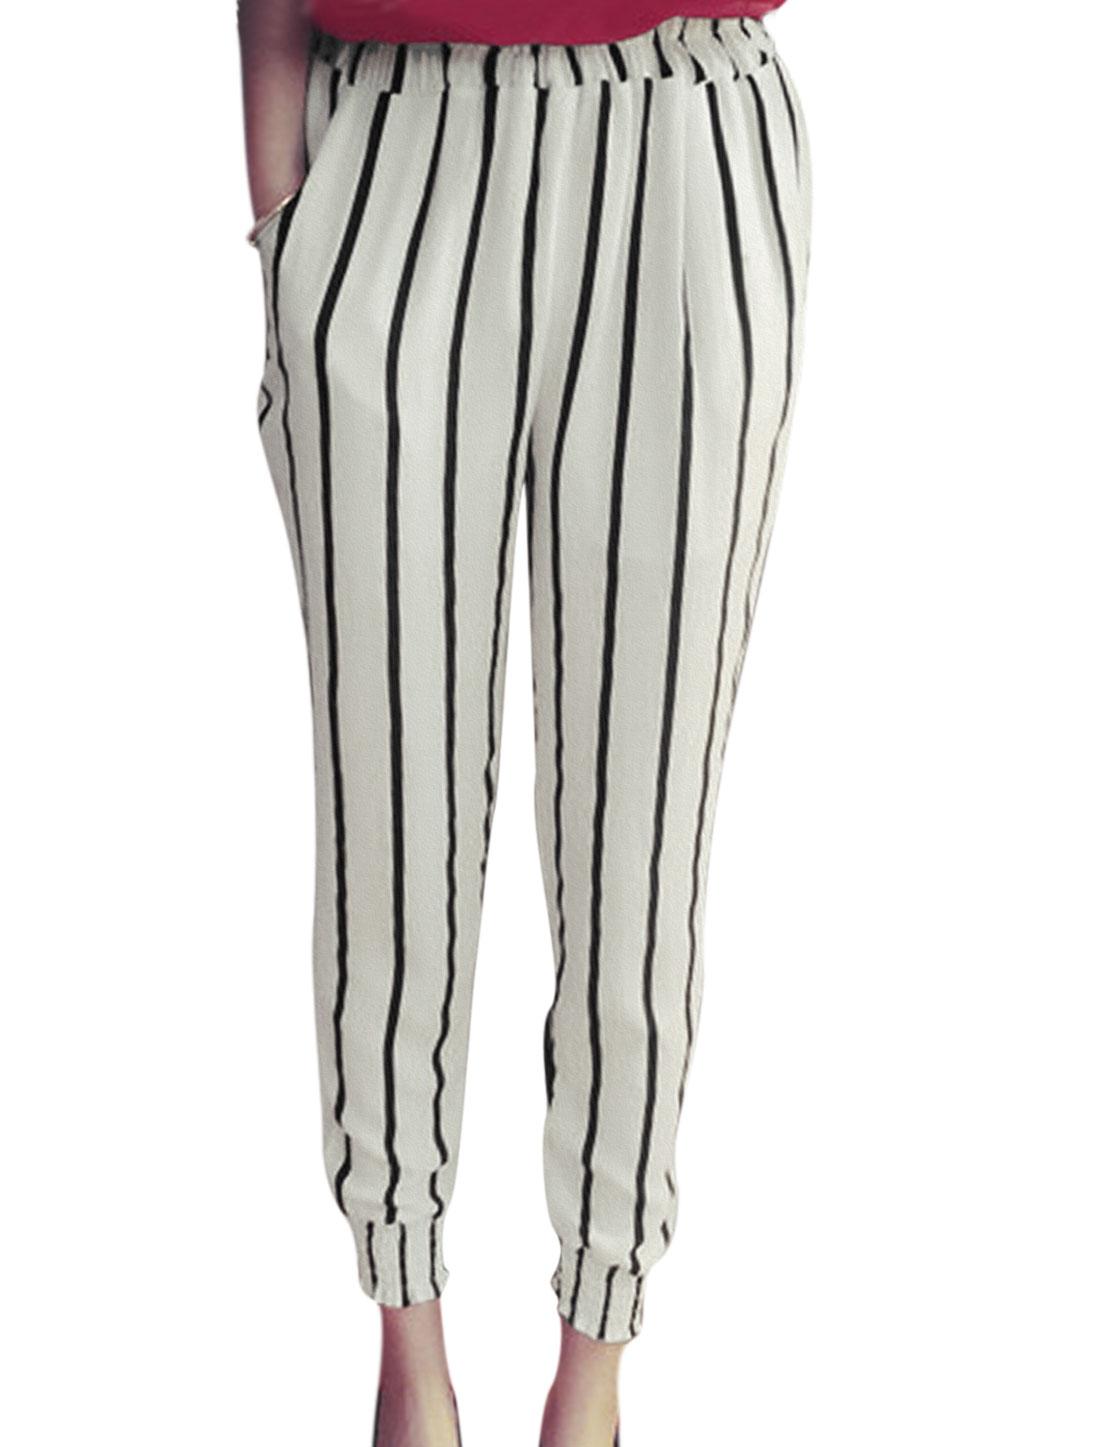 Lady Mixed Vertical Stripes Leisure Chiffon Cropped Pants White XS